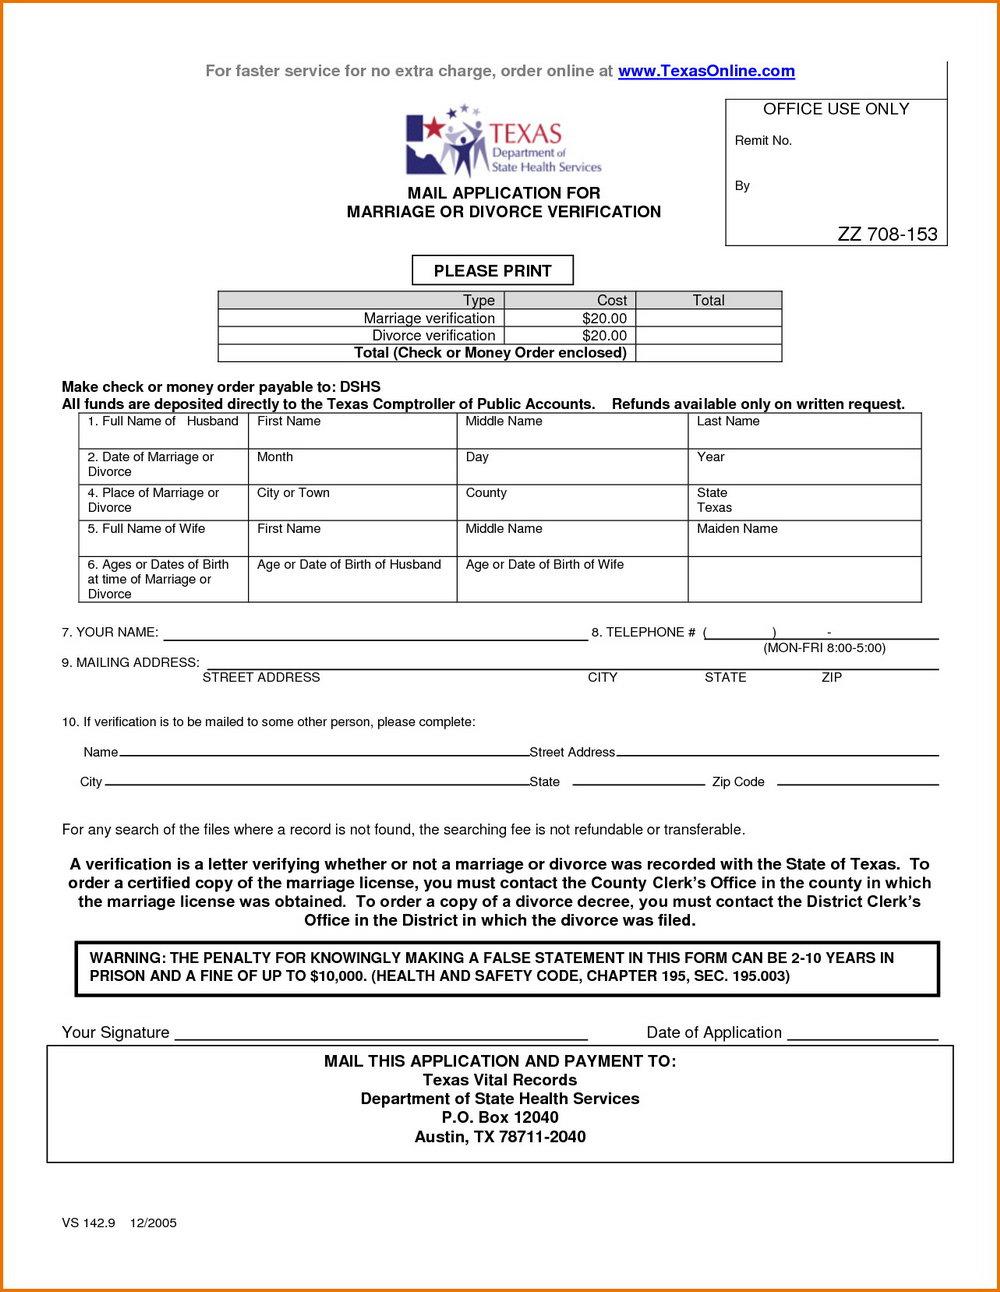 Indiana Divorce Forms In.gov